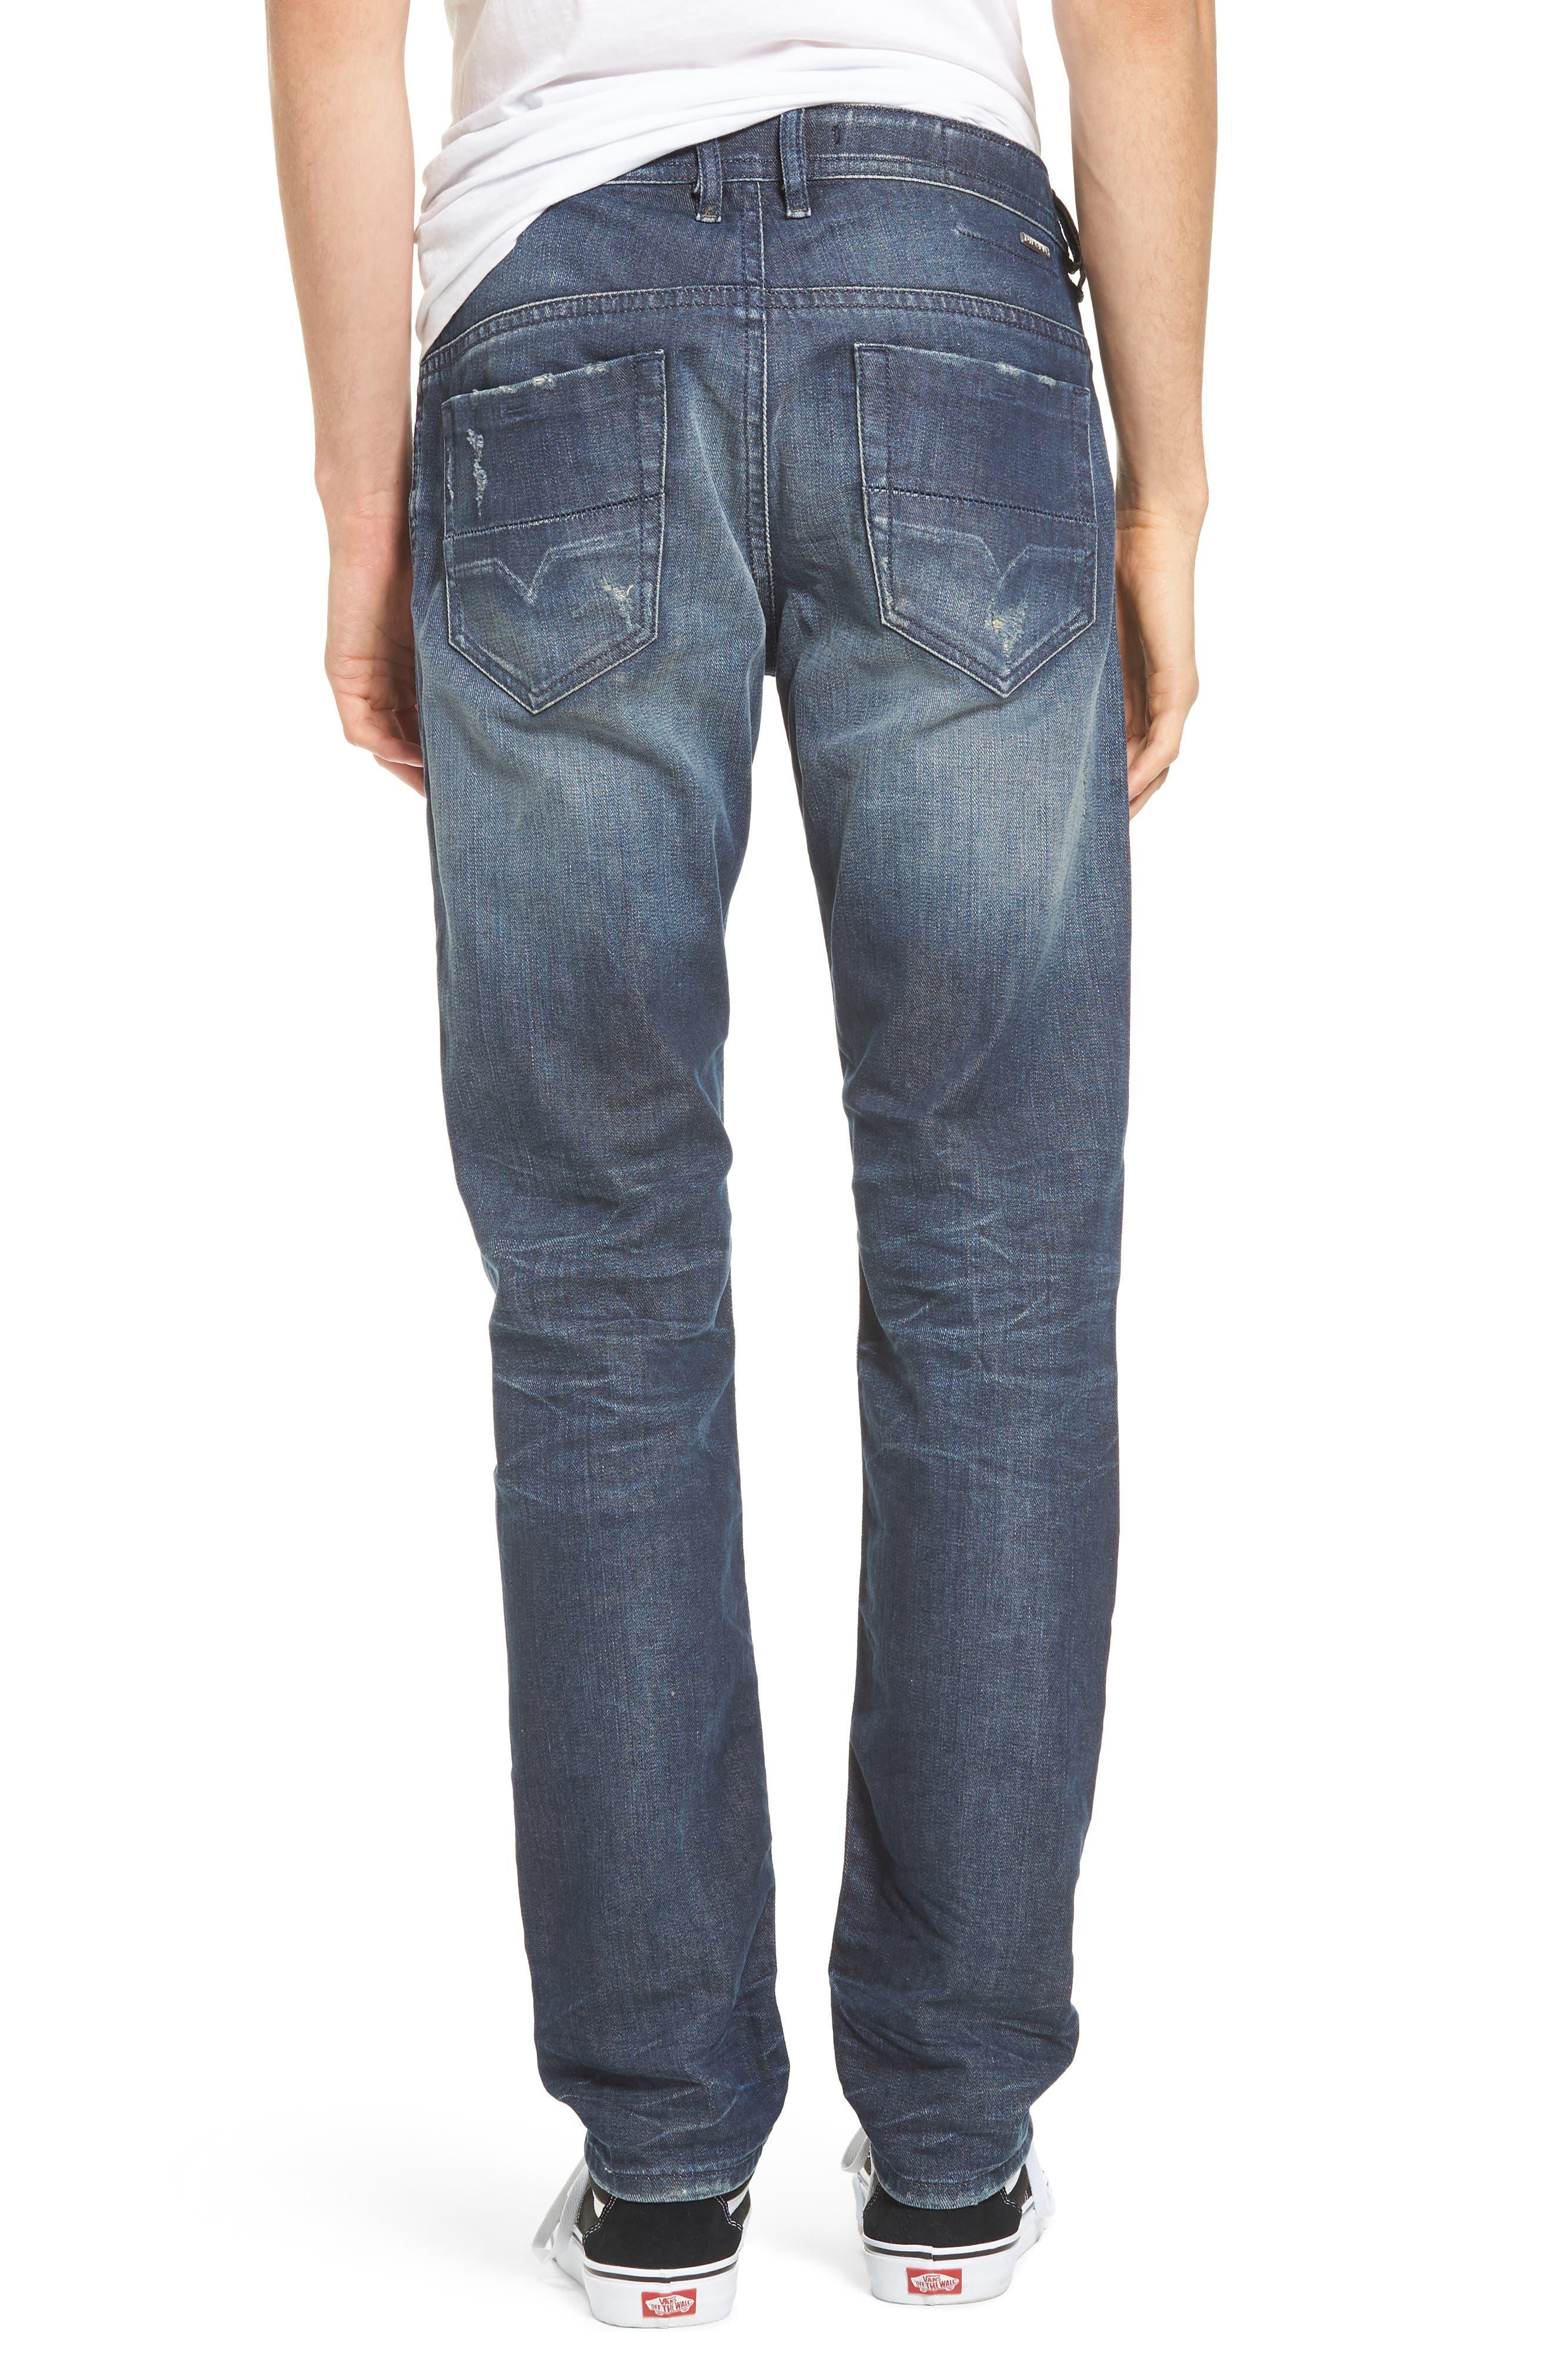 Thommer Slim Fit Jeans,                             Alternate thumbnail 2, color,                             Denim